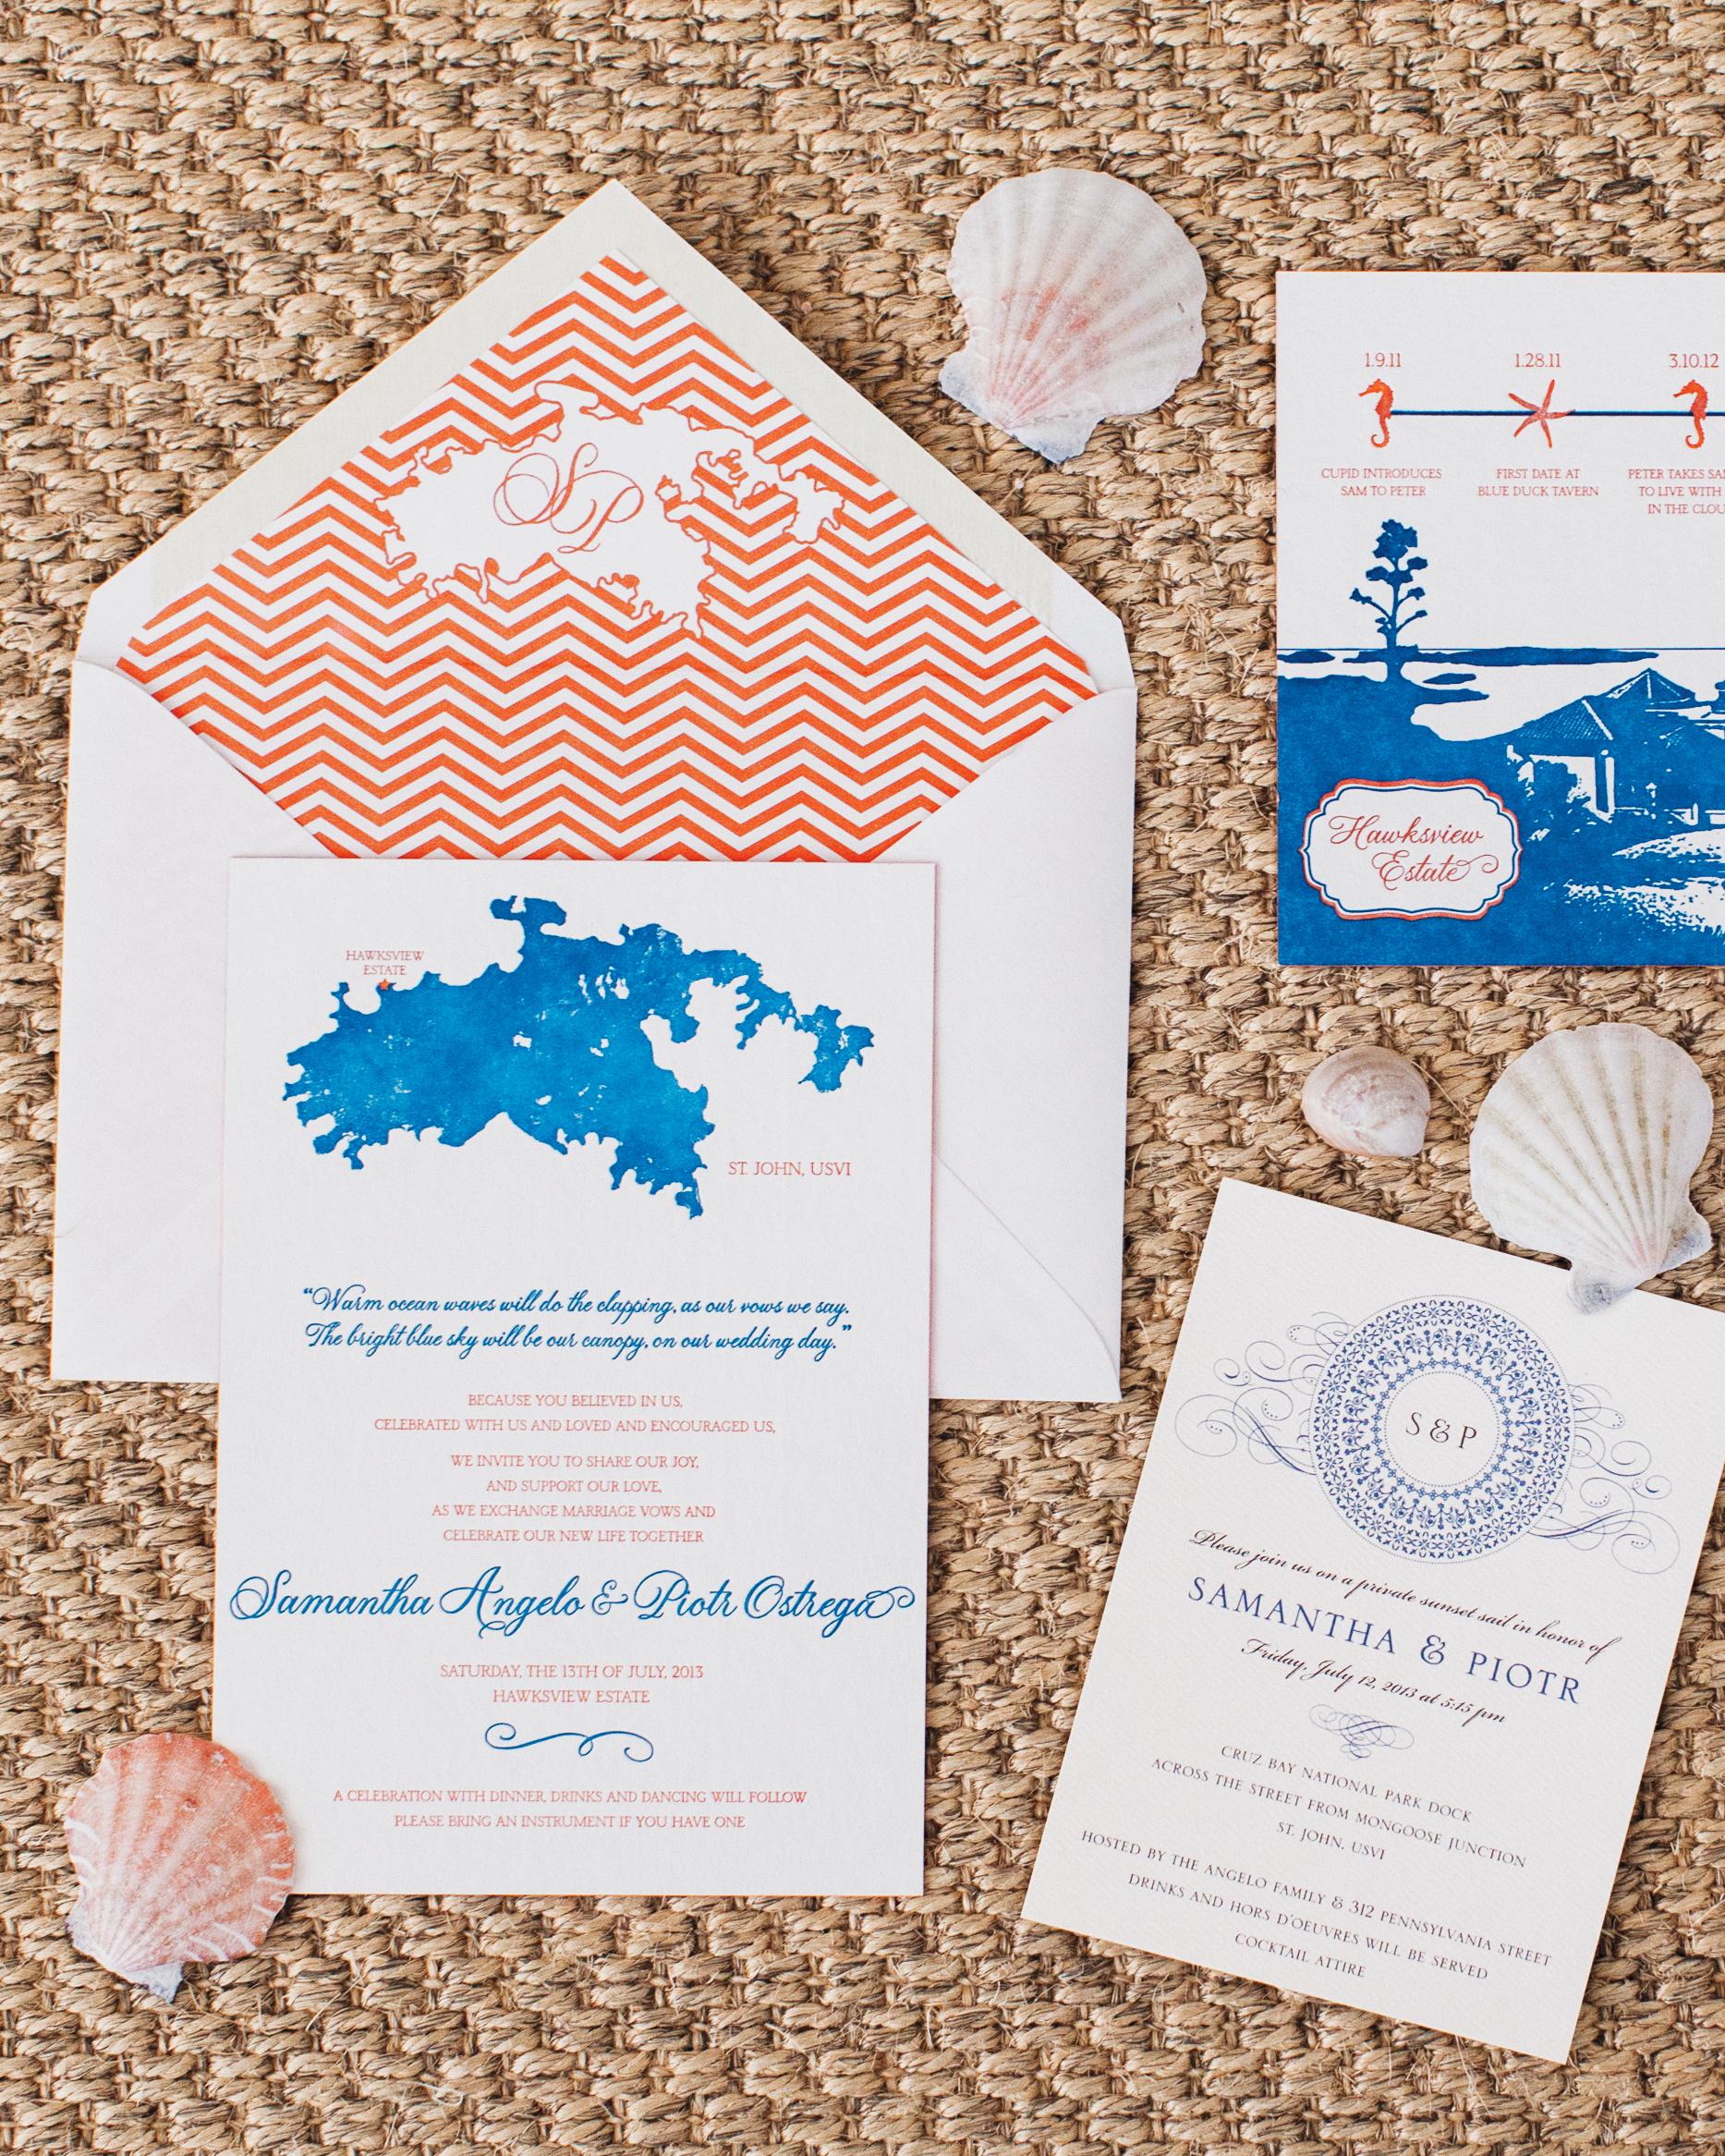 invitation-seashell-stjohnusvi-msw-2631-mwds110805.jpg